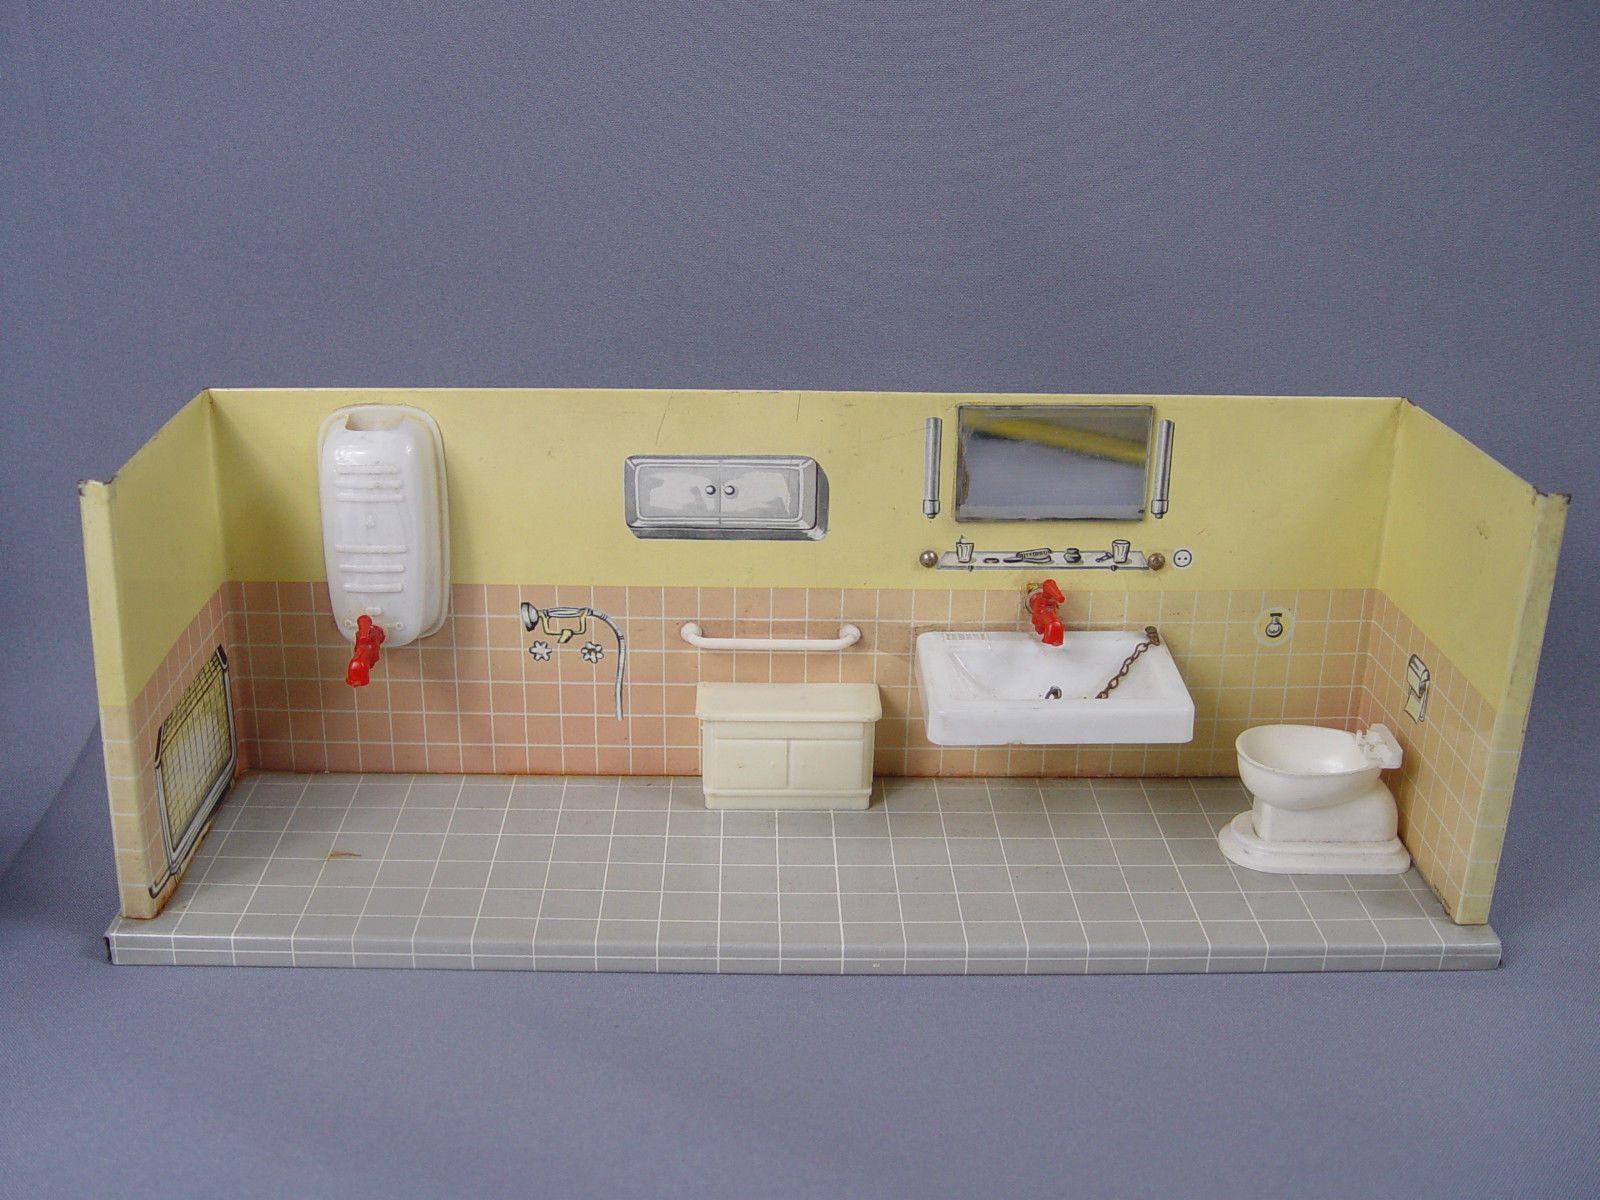 German metal bath with plastic fixtures. Missing tub ...